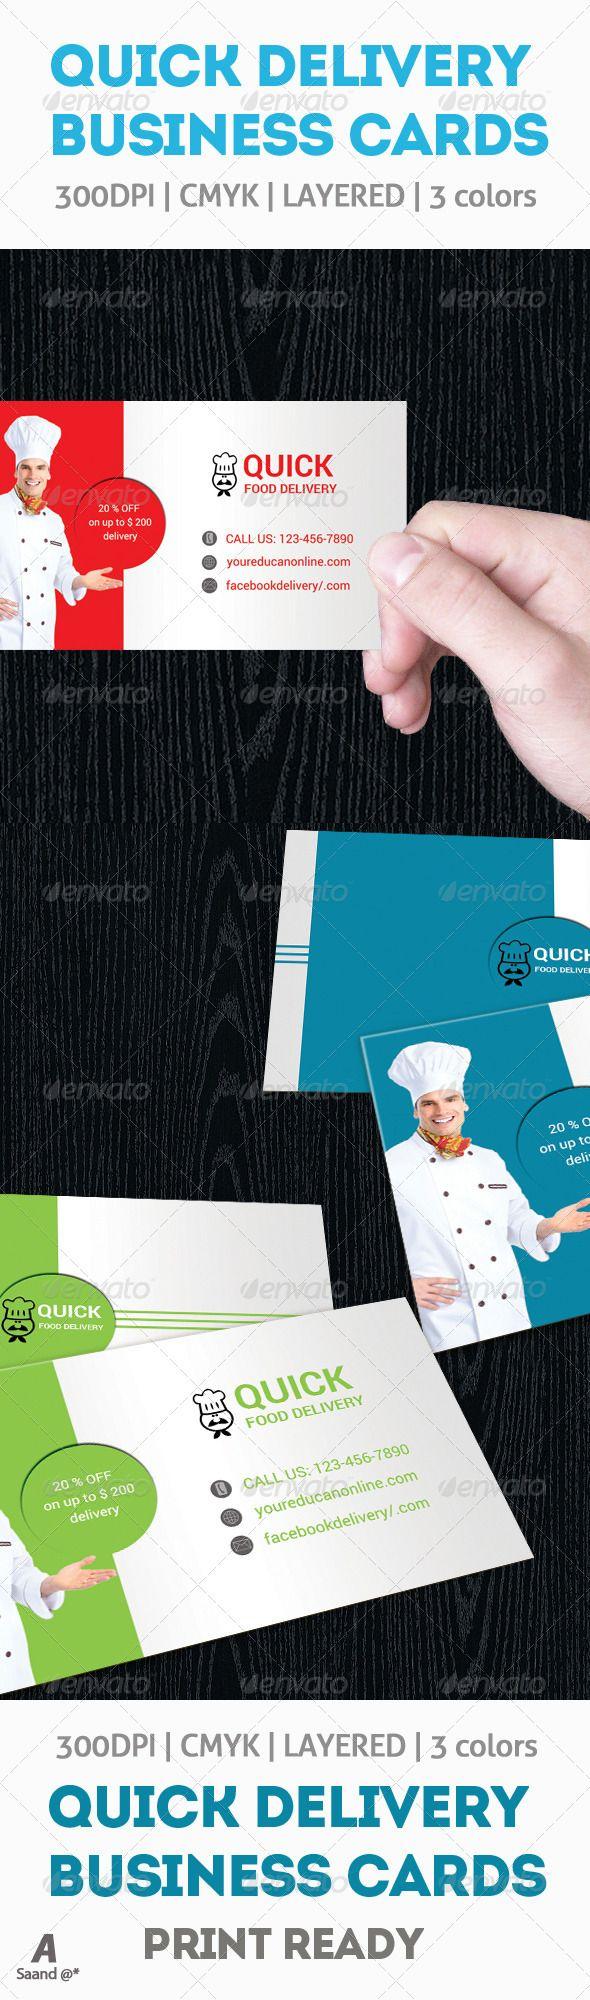 74 best Print Templates images on Pinterest | Print templates, Adobe ...